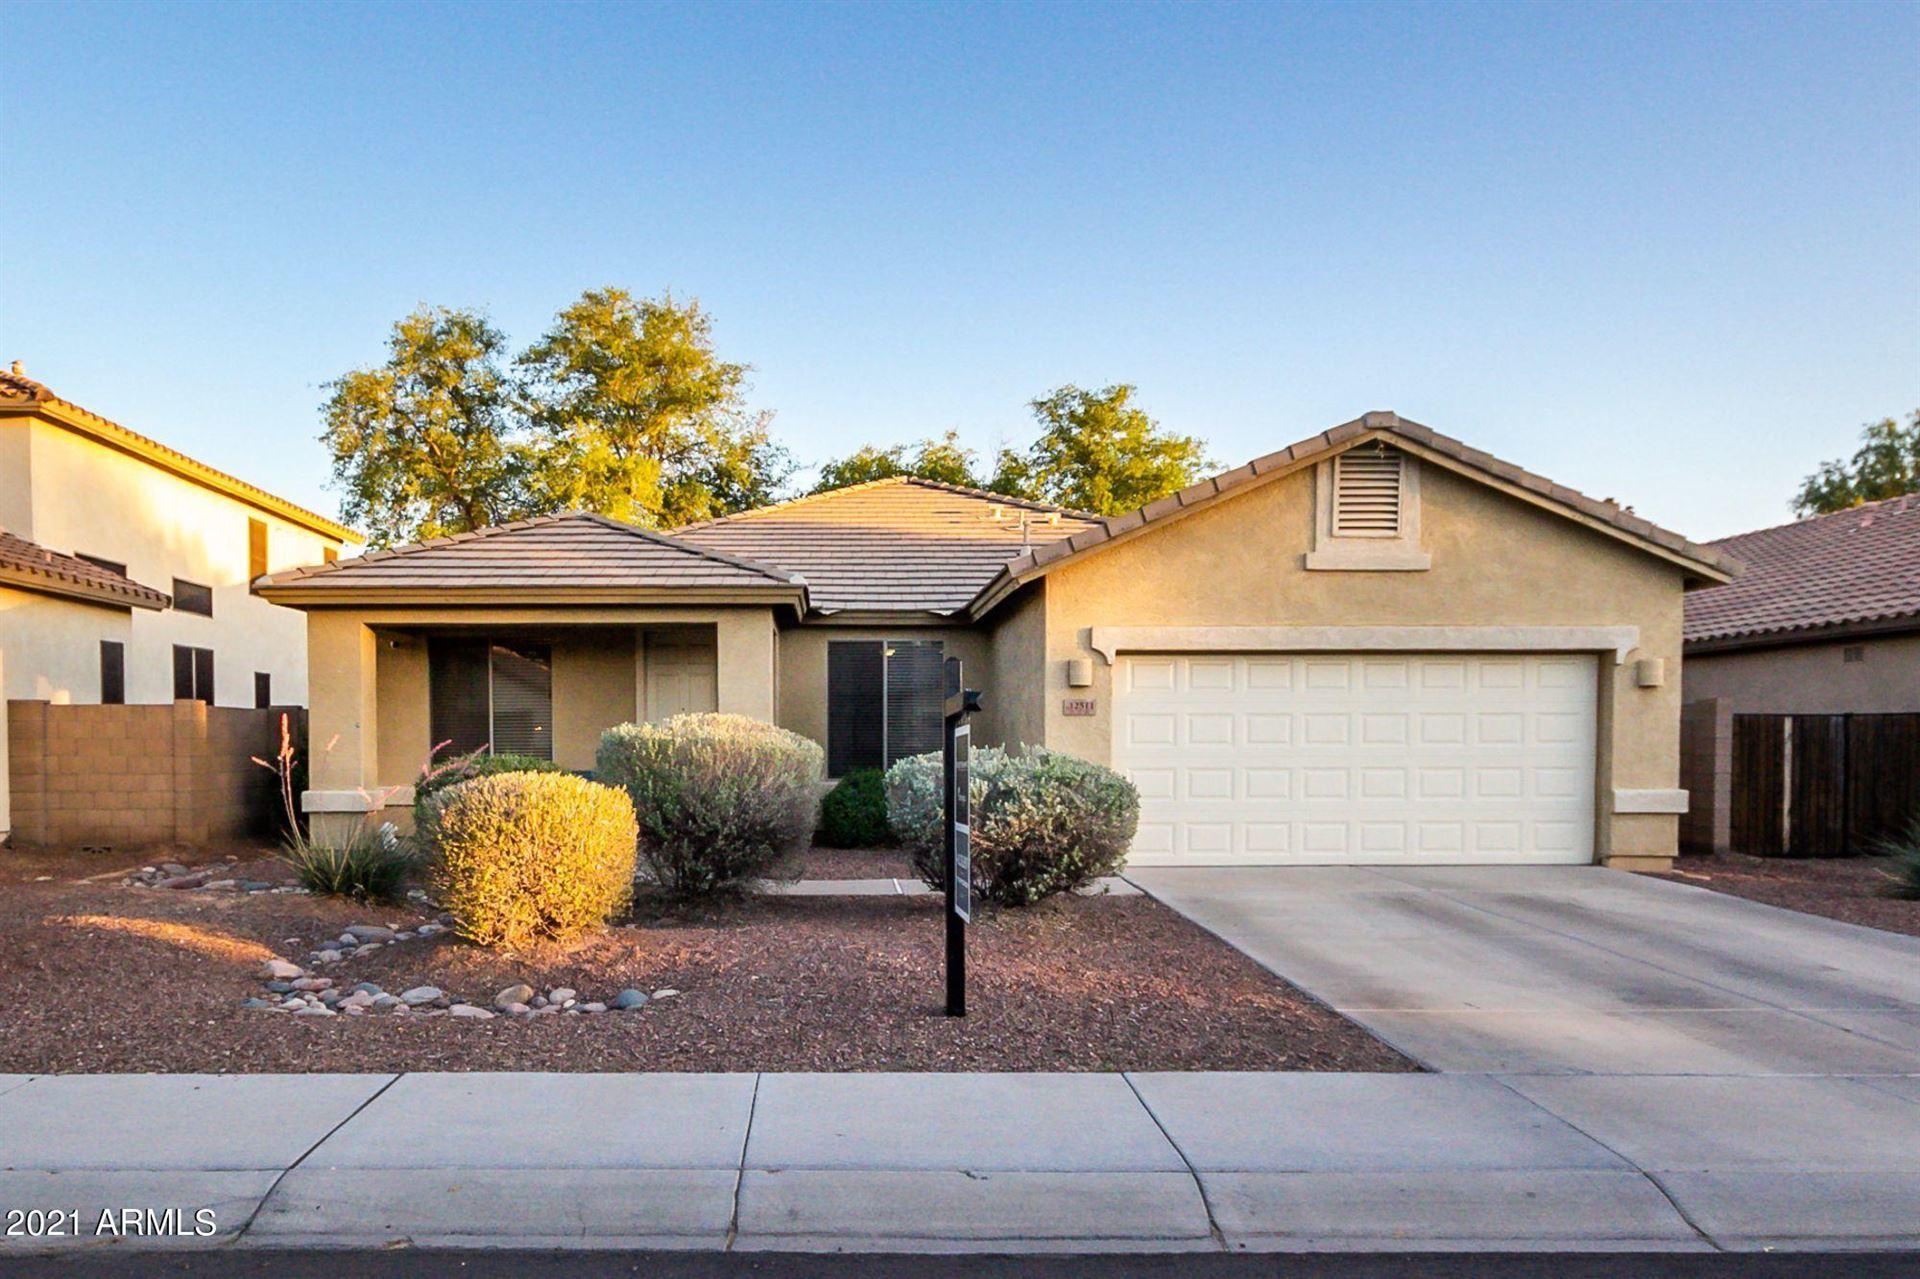 12511 W GLENROSA Drive, Litchfield Park, AZ 85340 - MLS#: 6236748